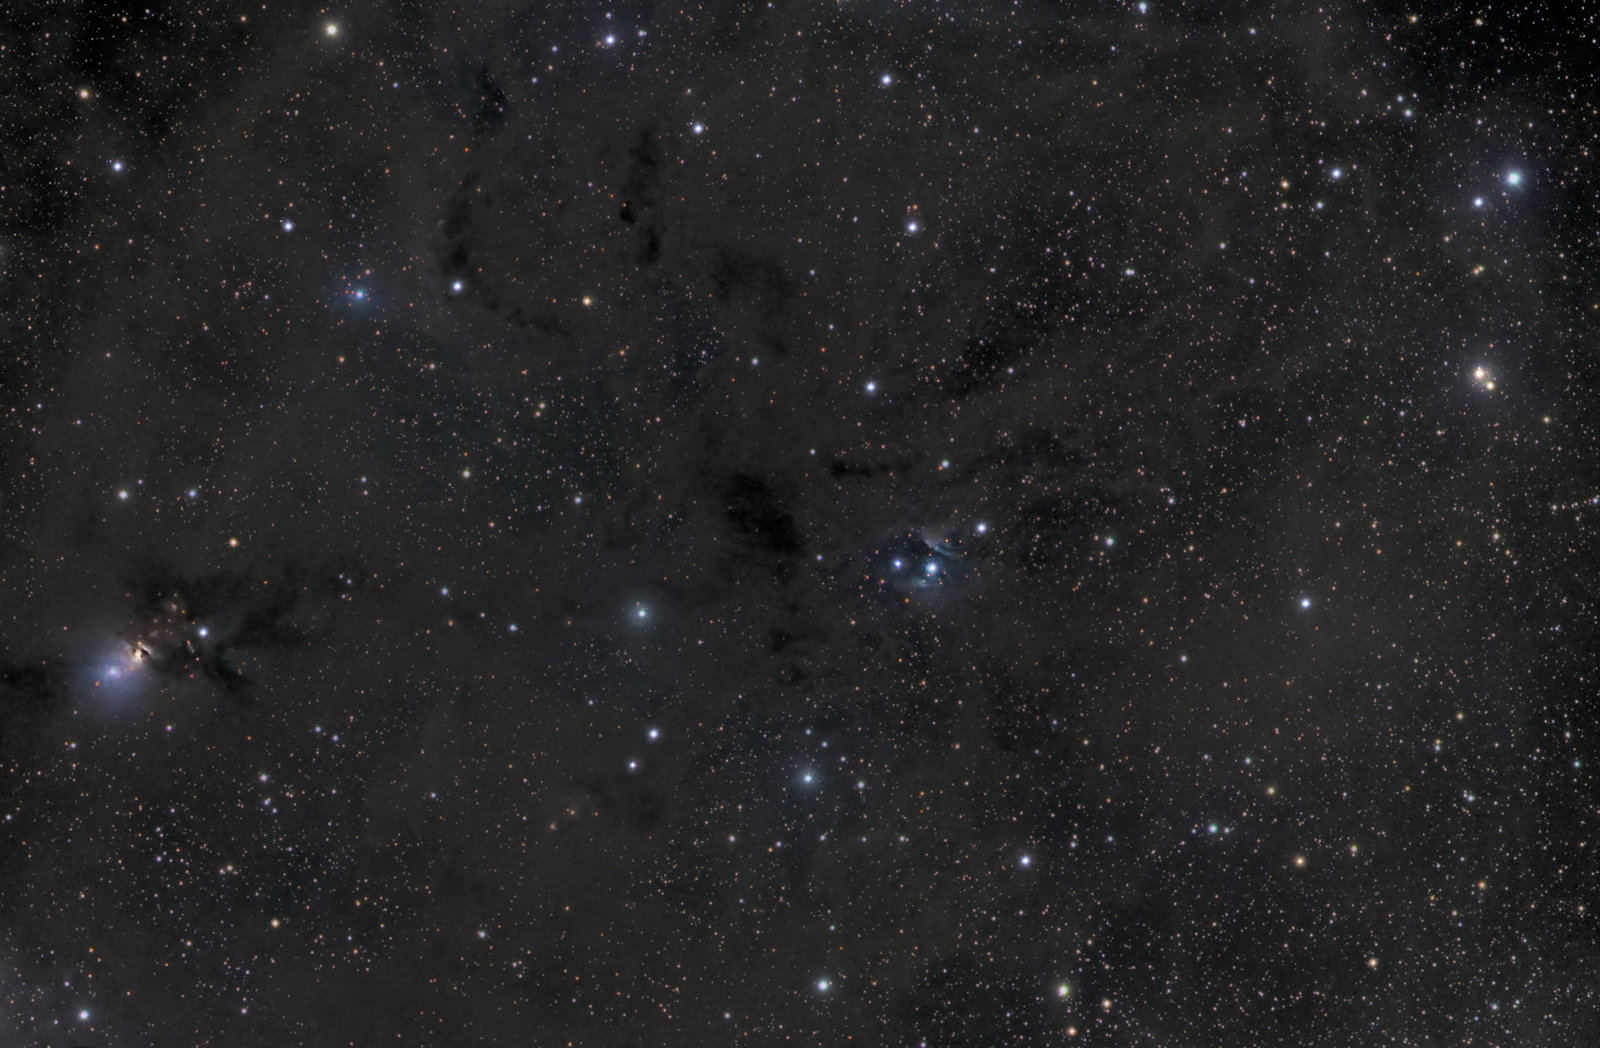 NGC1333a.thumb.jpg.b44adb3f47b994d2e5f17aca4e9f7fba.jpg